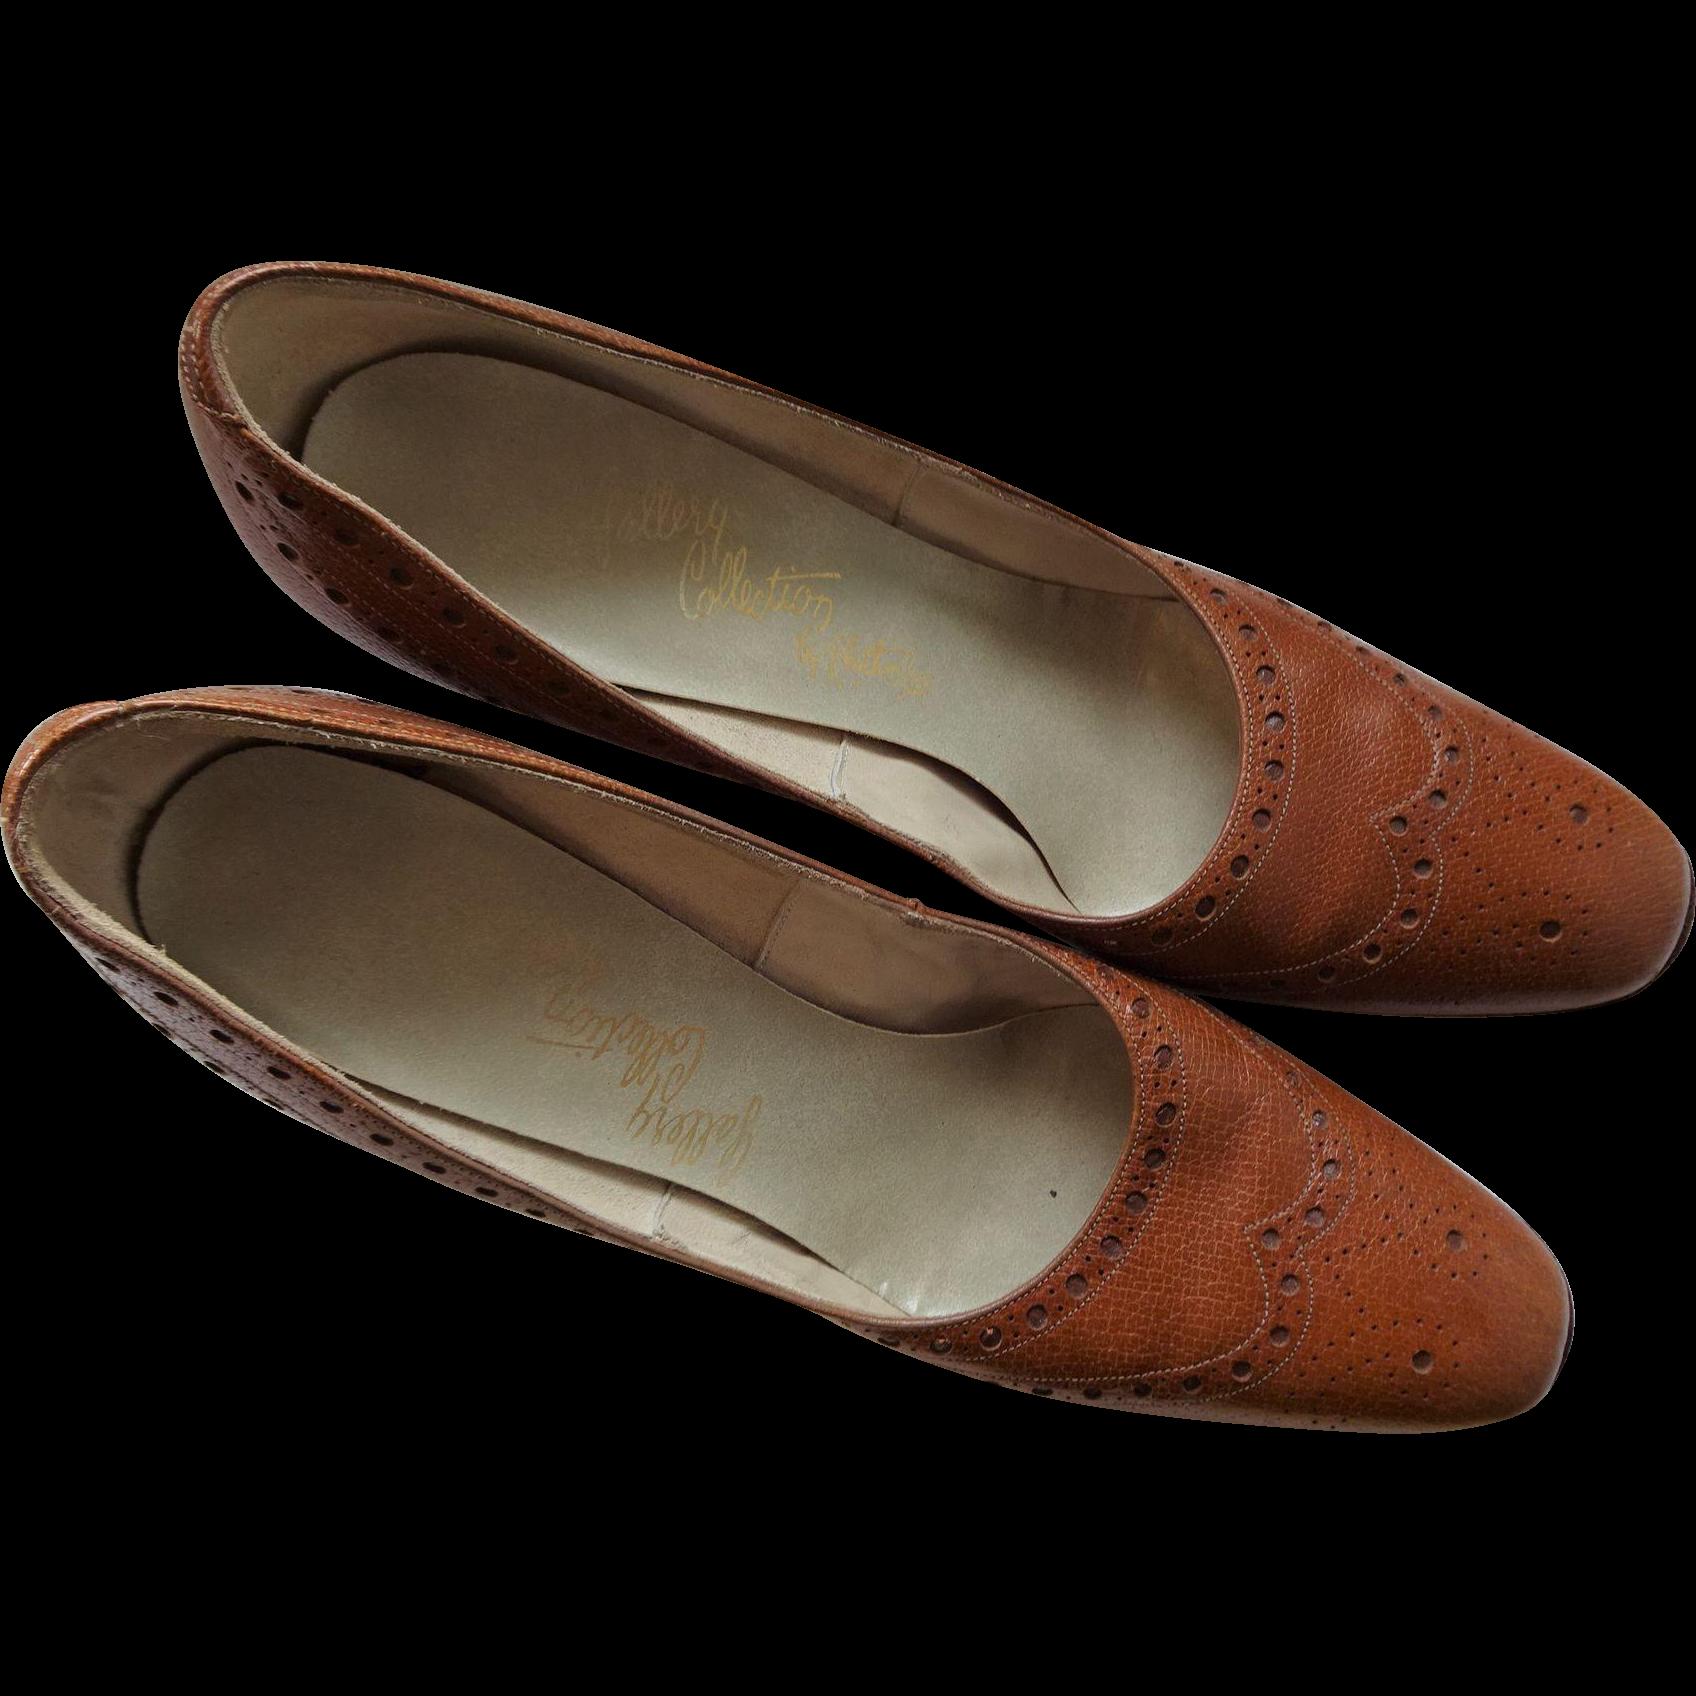 Amazon.com: wingtip shoes women: Clothing, Shoes & Jewelry